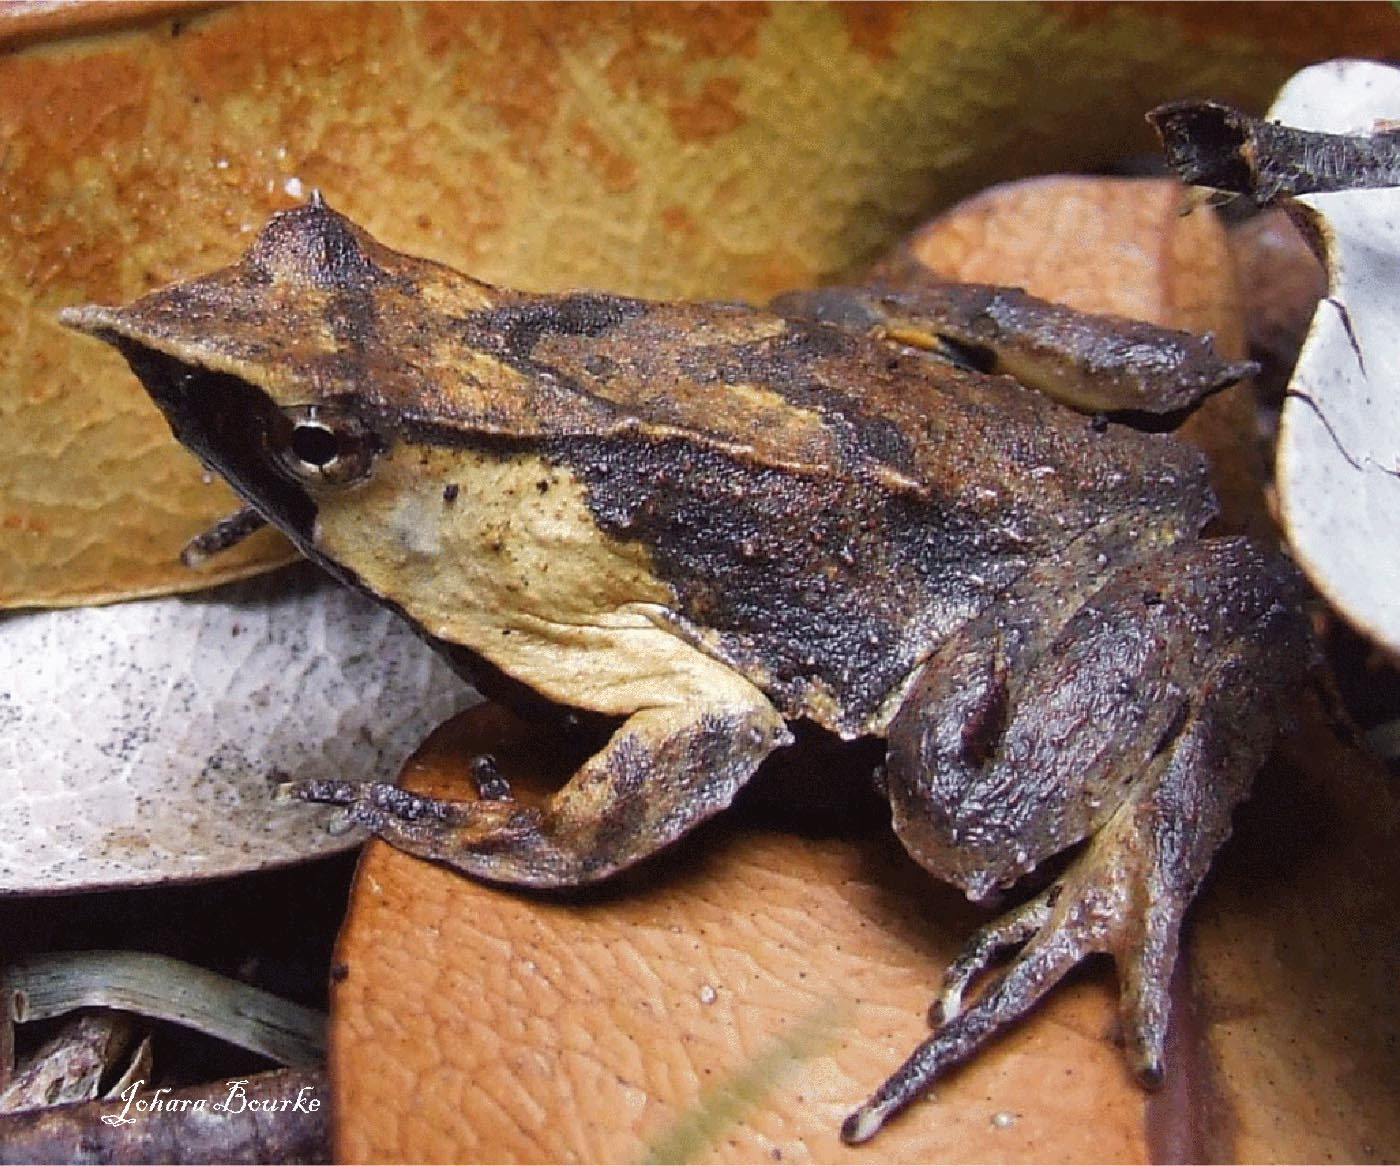 Rhinoderma-darwinii-Johara-Bourke